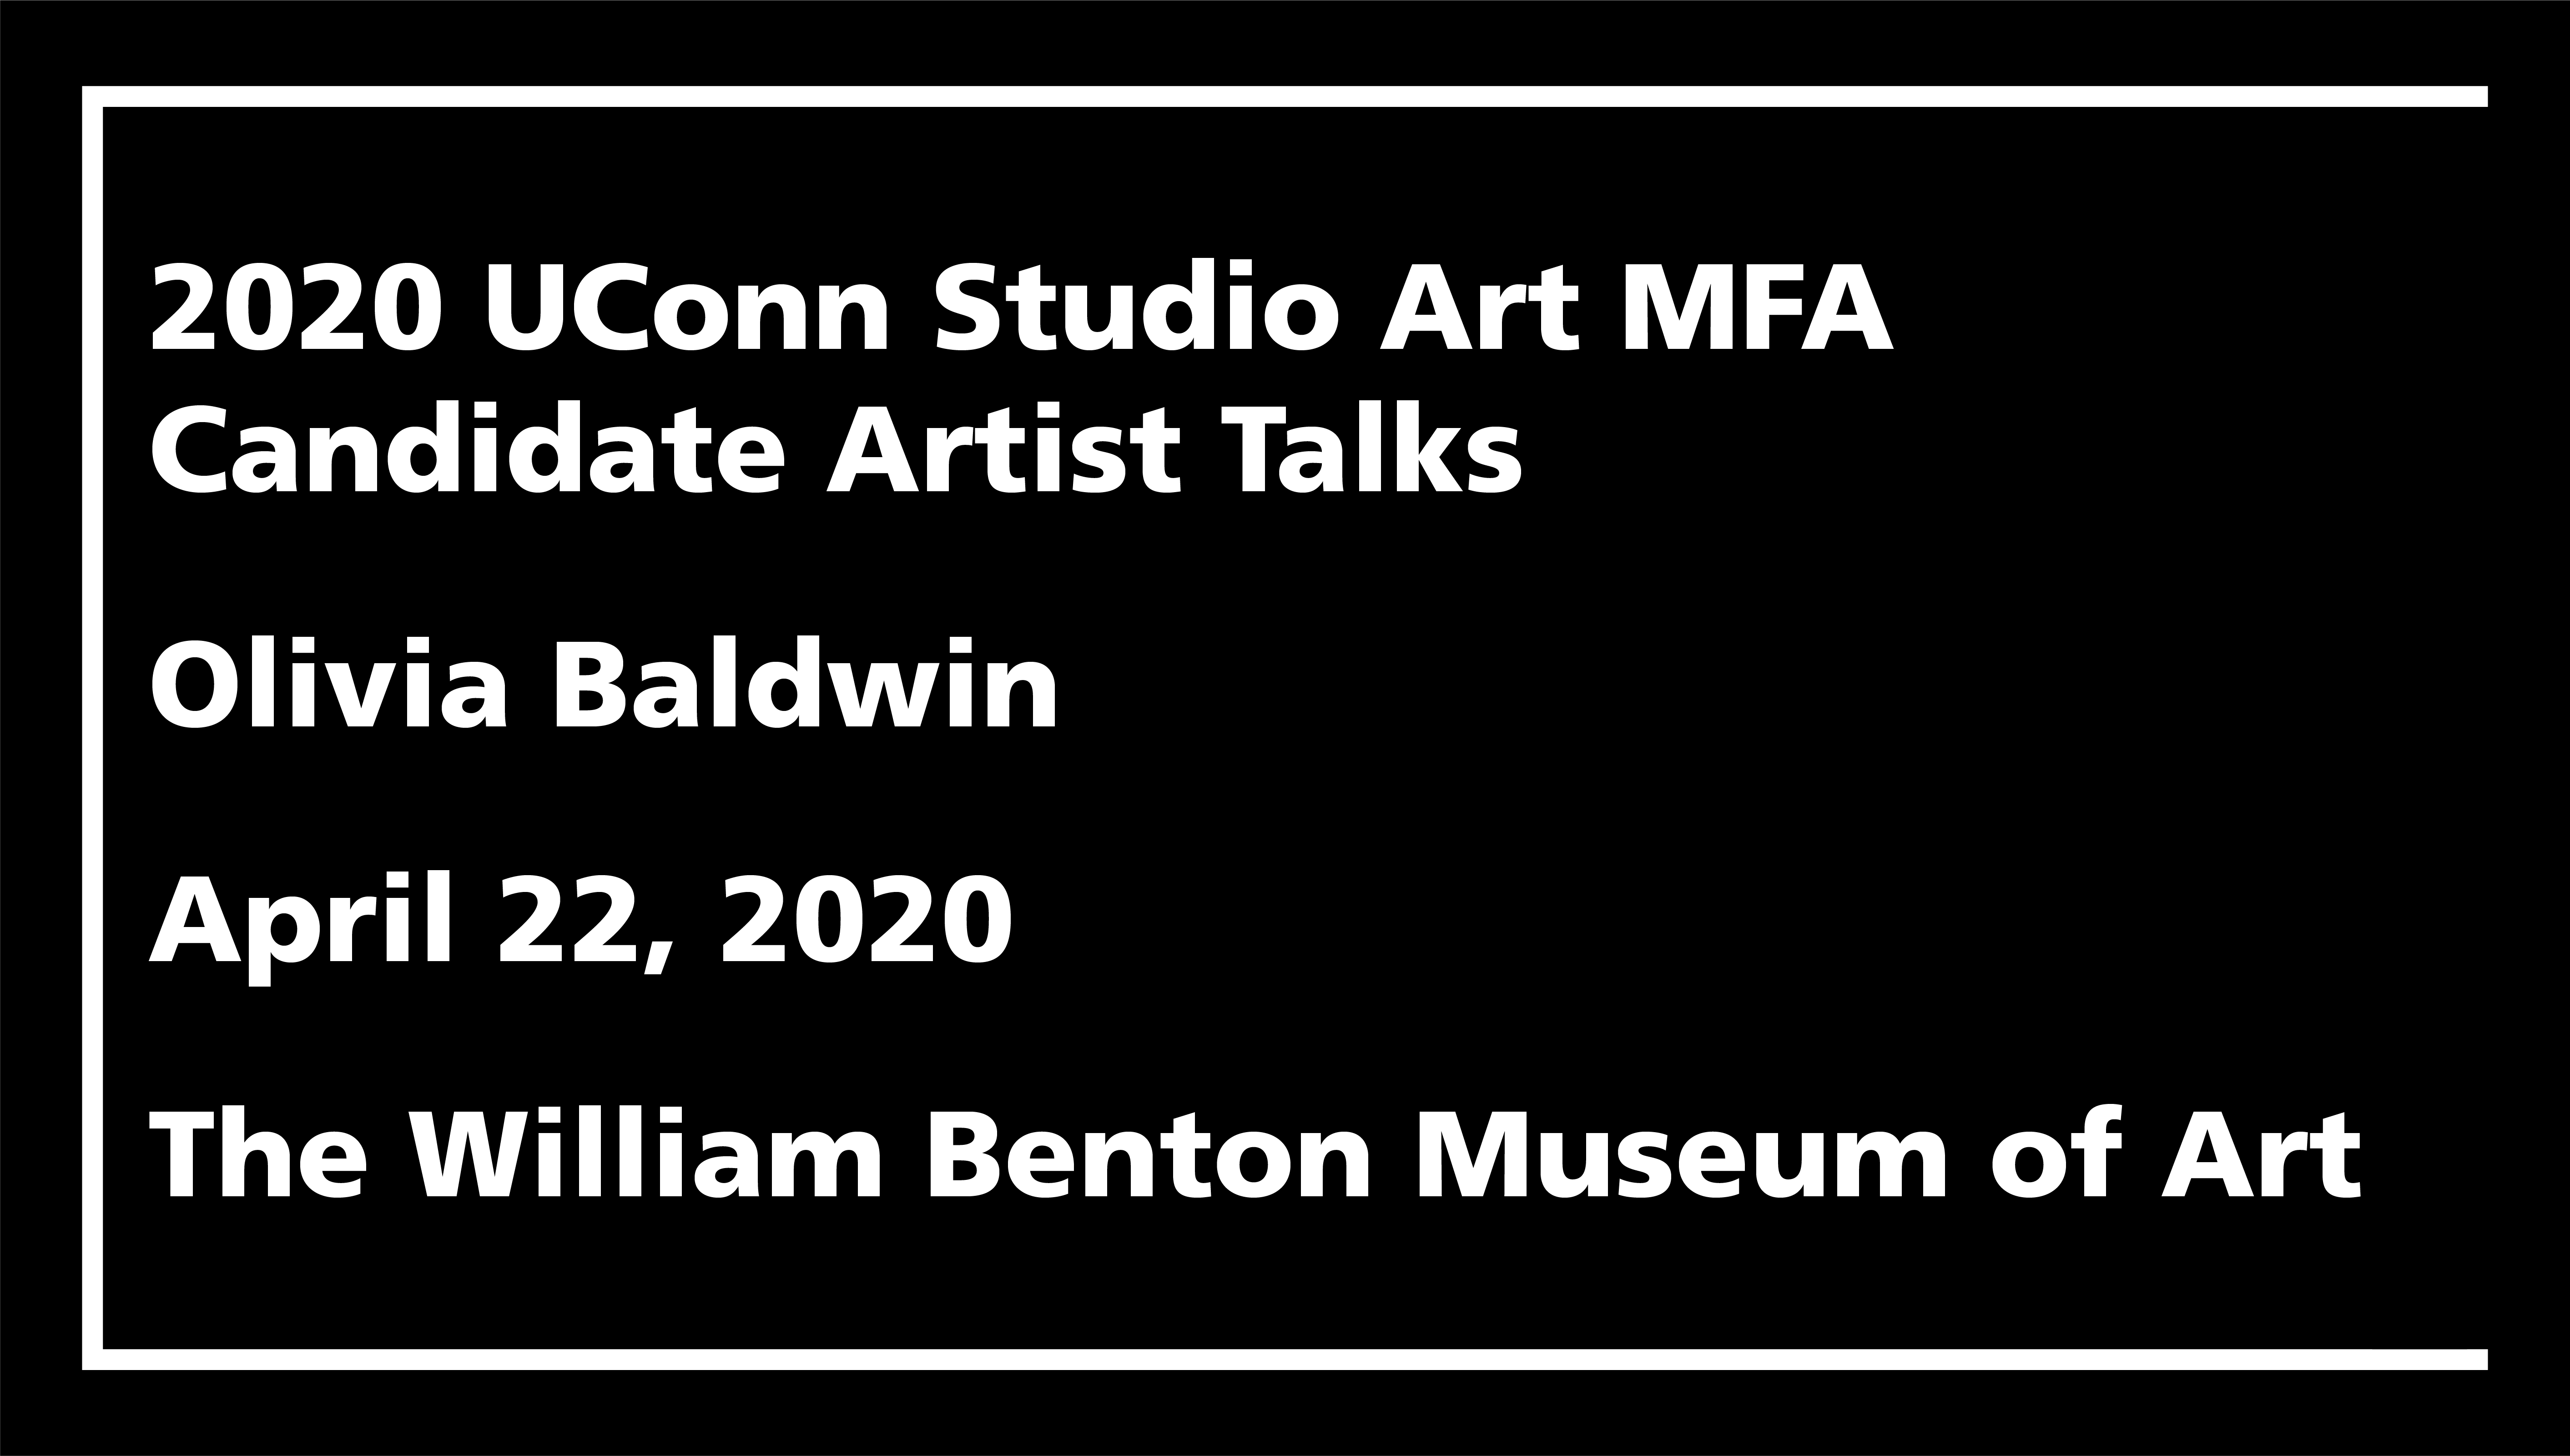 2020 UConn Studio Art MFA Candidate Artist Talks: Olivia Baldwin